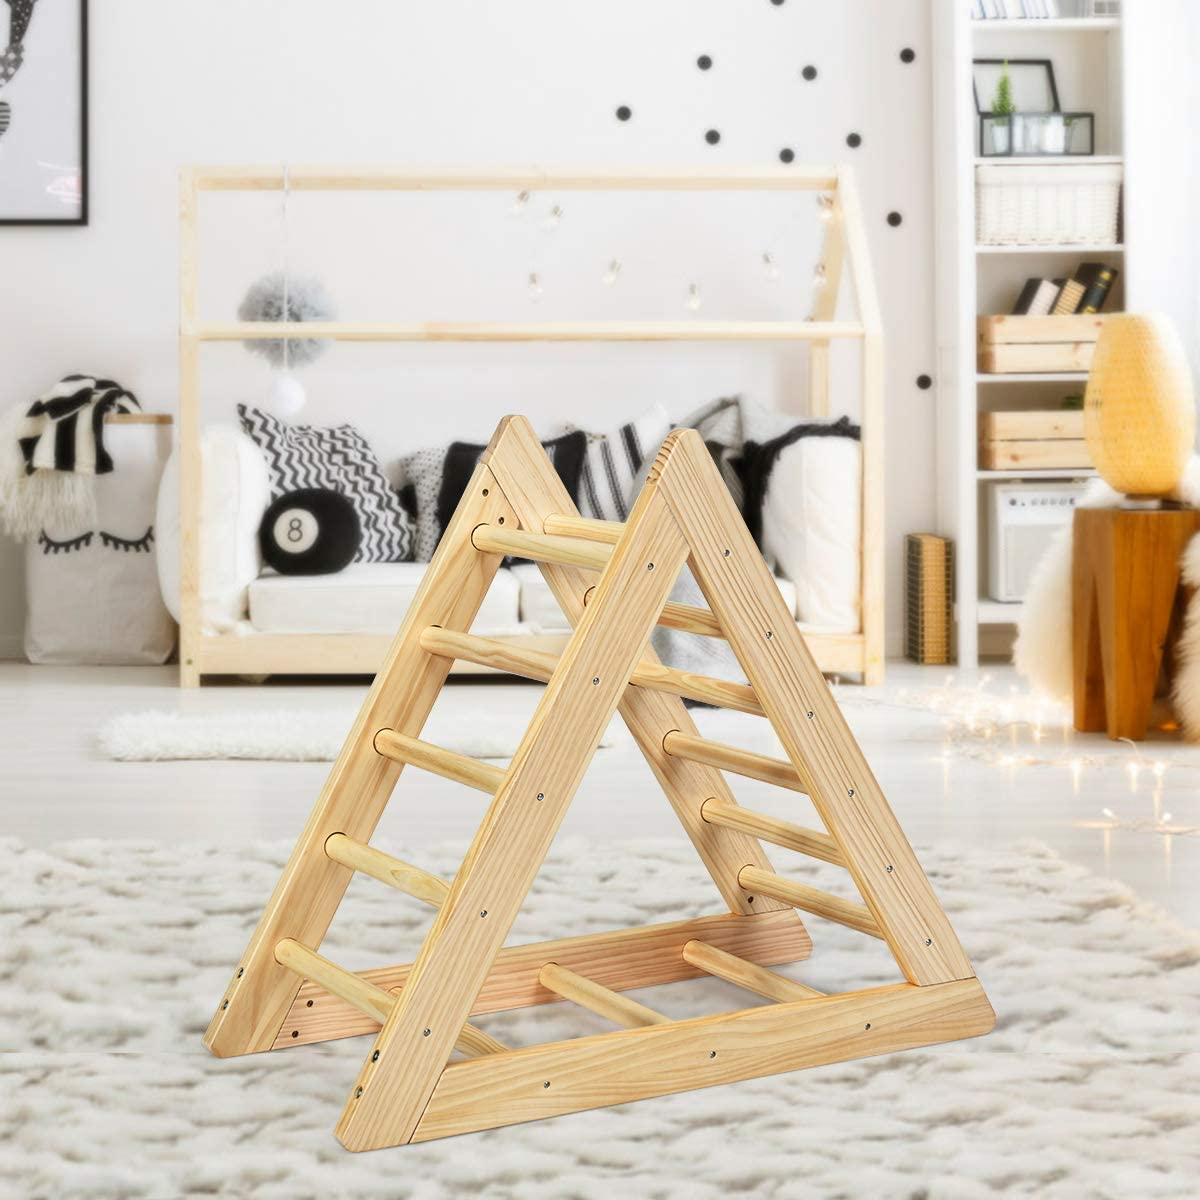 Triangle pikler montessori